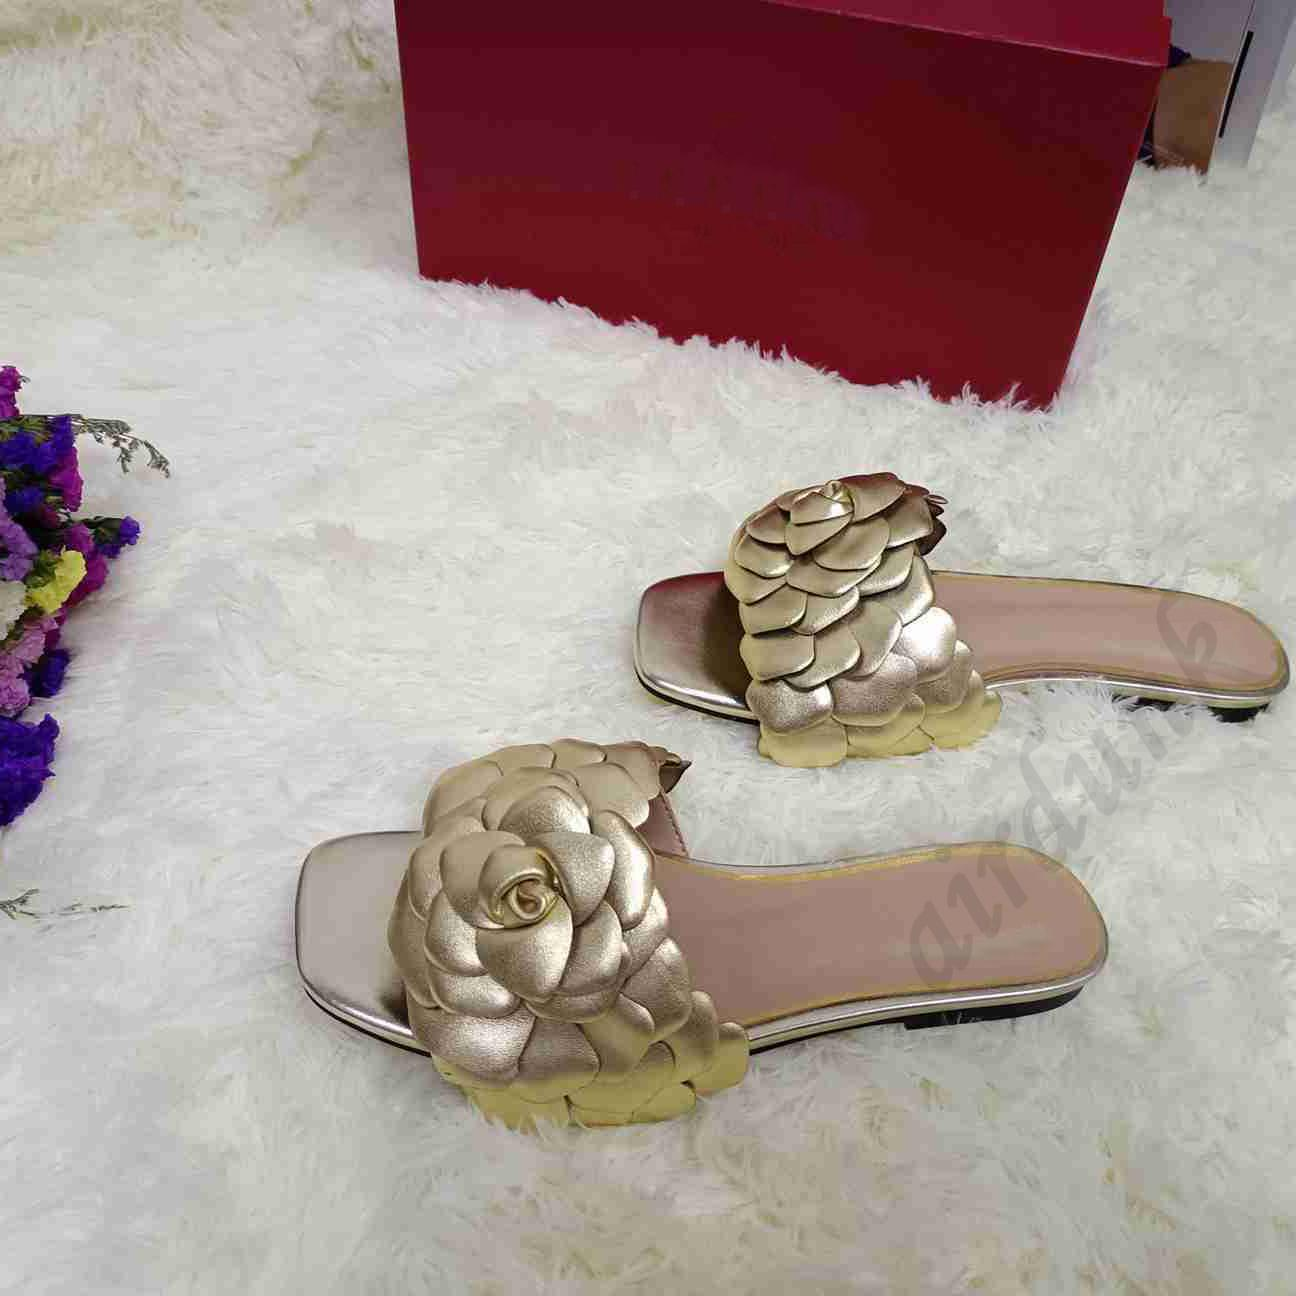 [Mit Box] 2021 Top Qualität Flache Ferse Frauen Slipper Leder Blume Blütenblätter Flip Flops Sandalen Flut Weibliche Hausschuhe